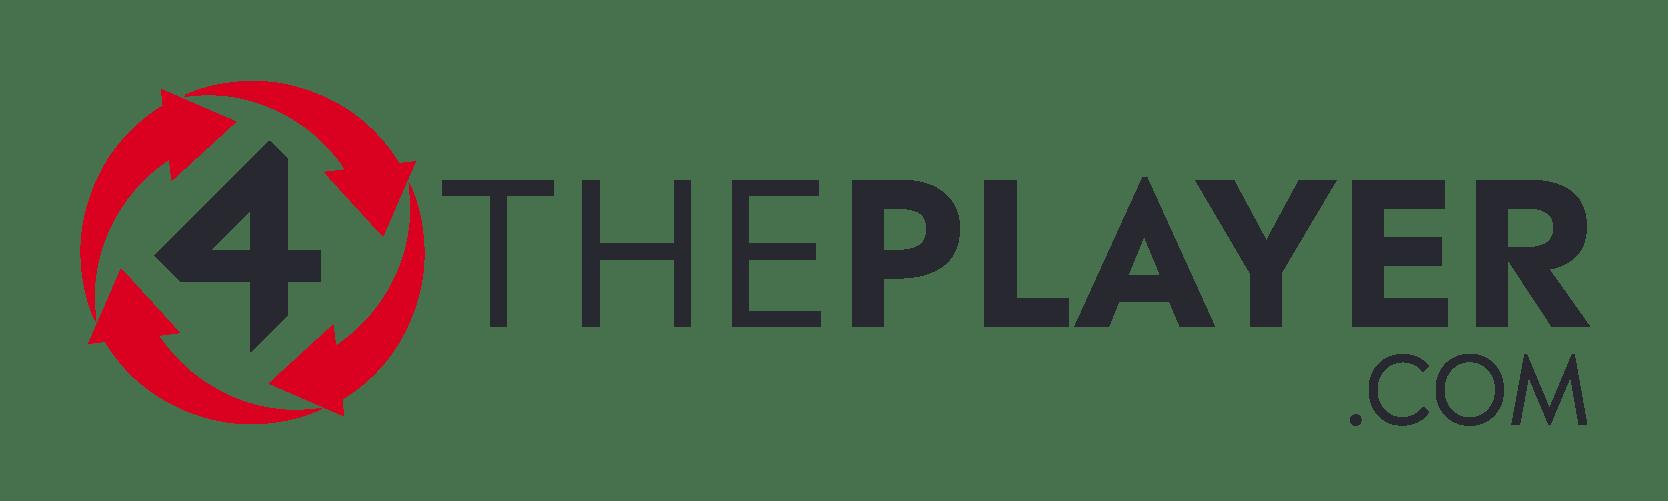 4ThePlayer juegos